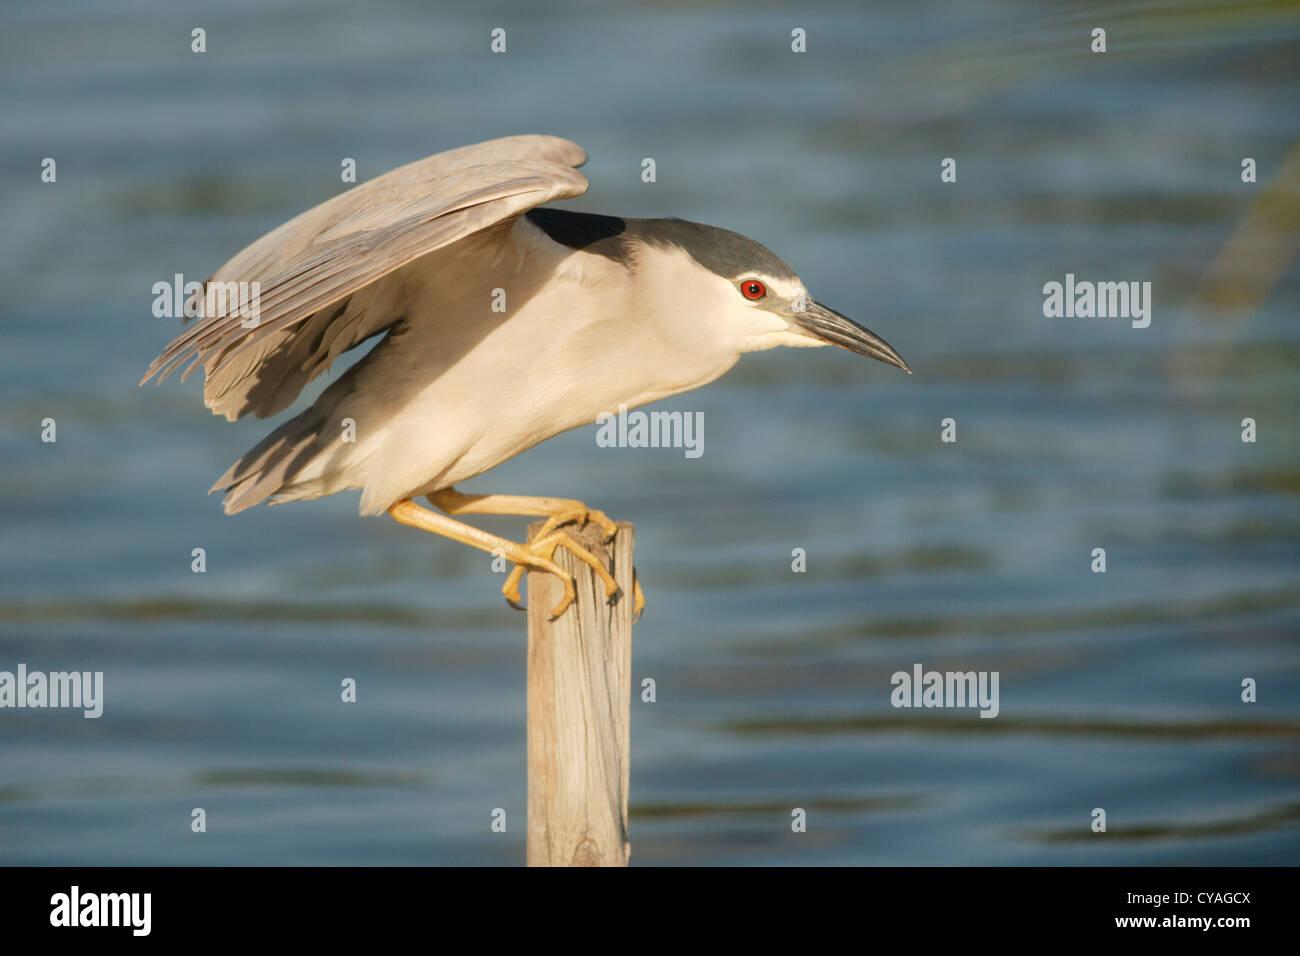 Black-crowned, Night-heron, Nycticorax nycticorax at Pont del Traves, Ebro Delta, Amposta,Catalonia Stock Photo